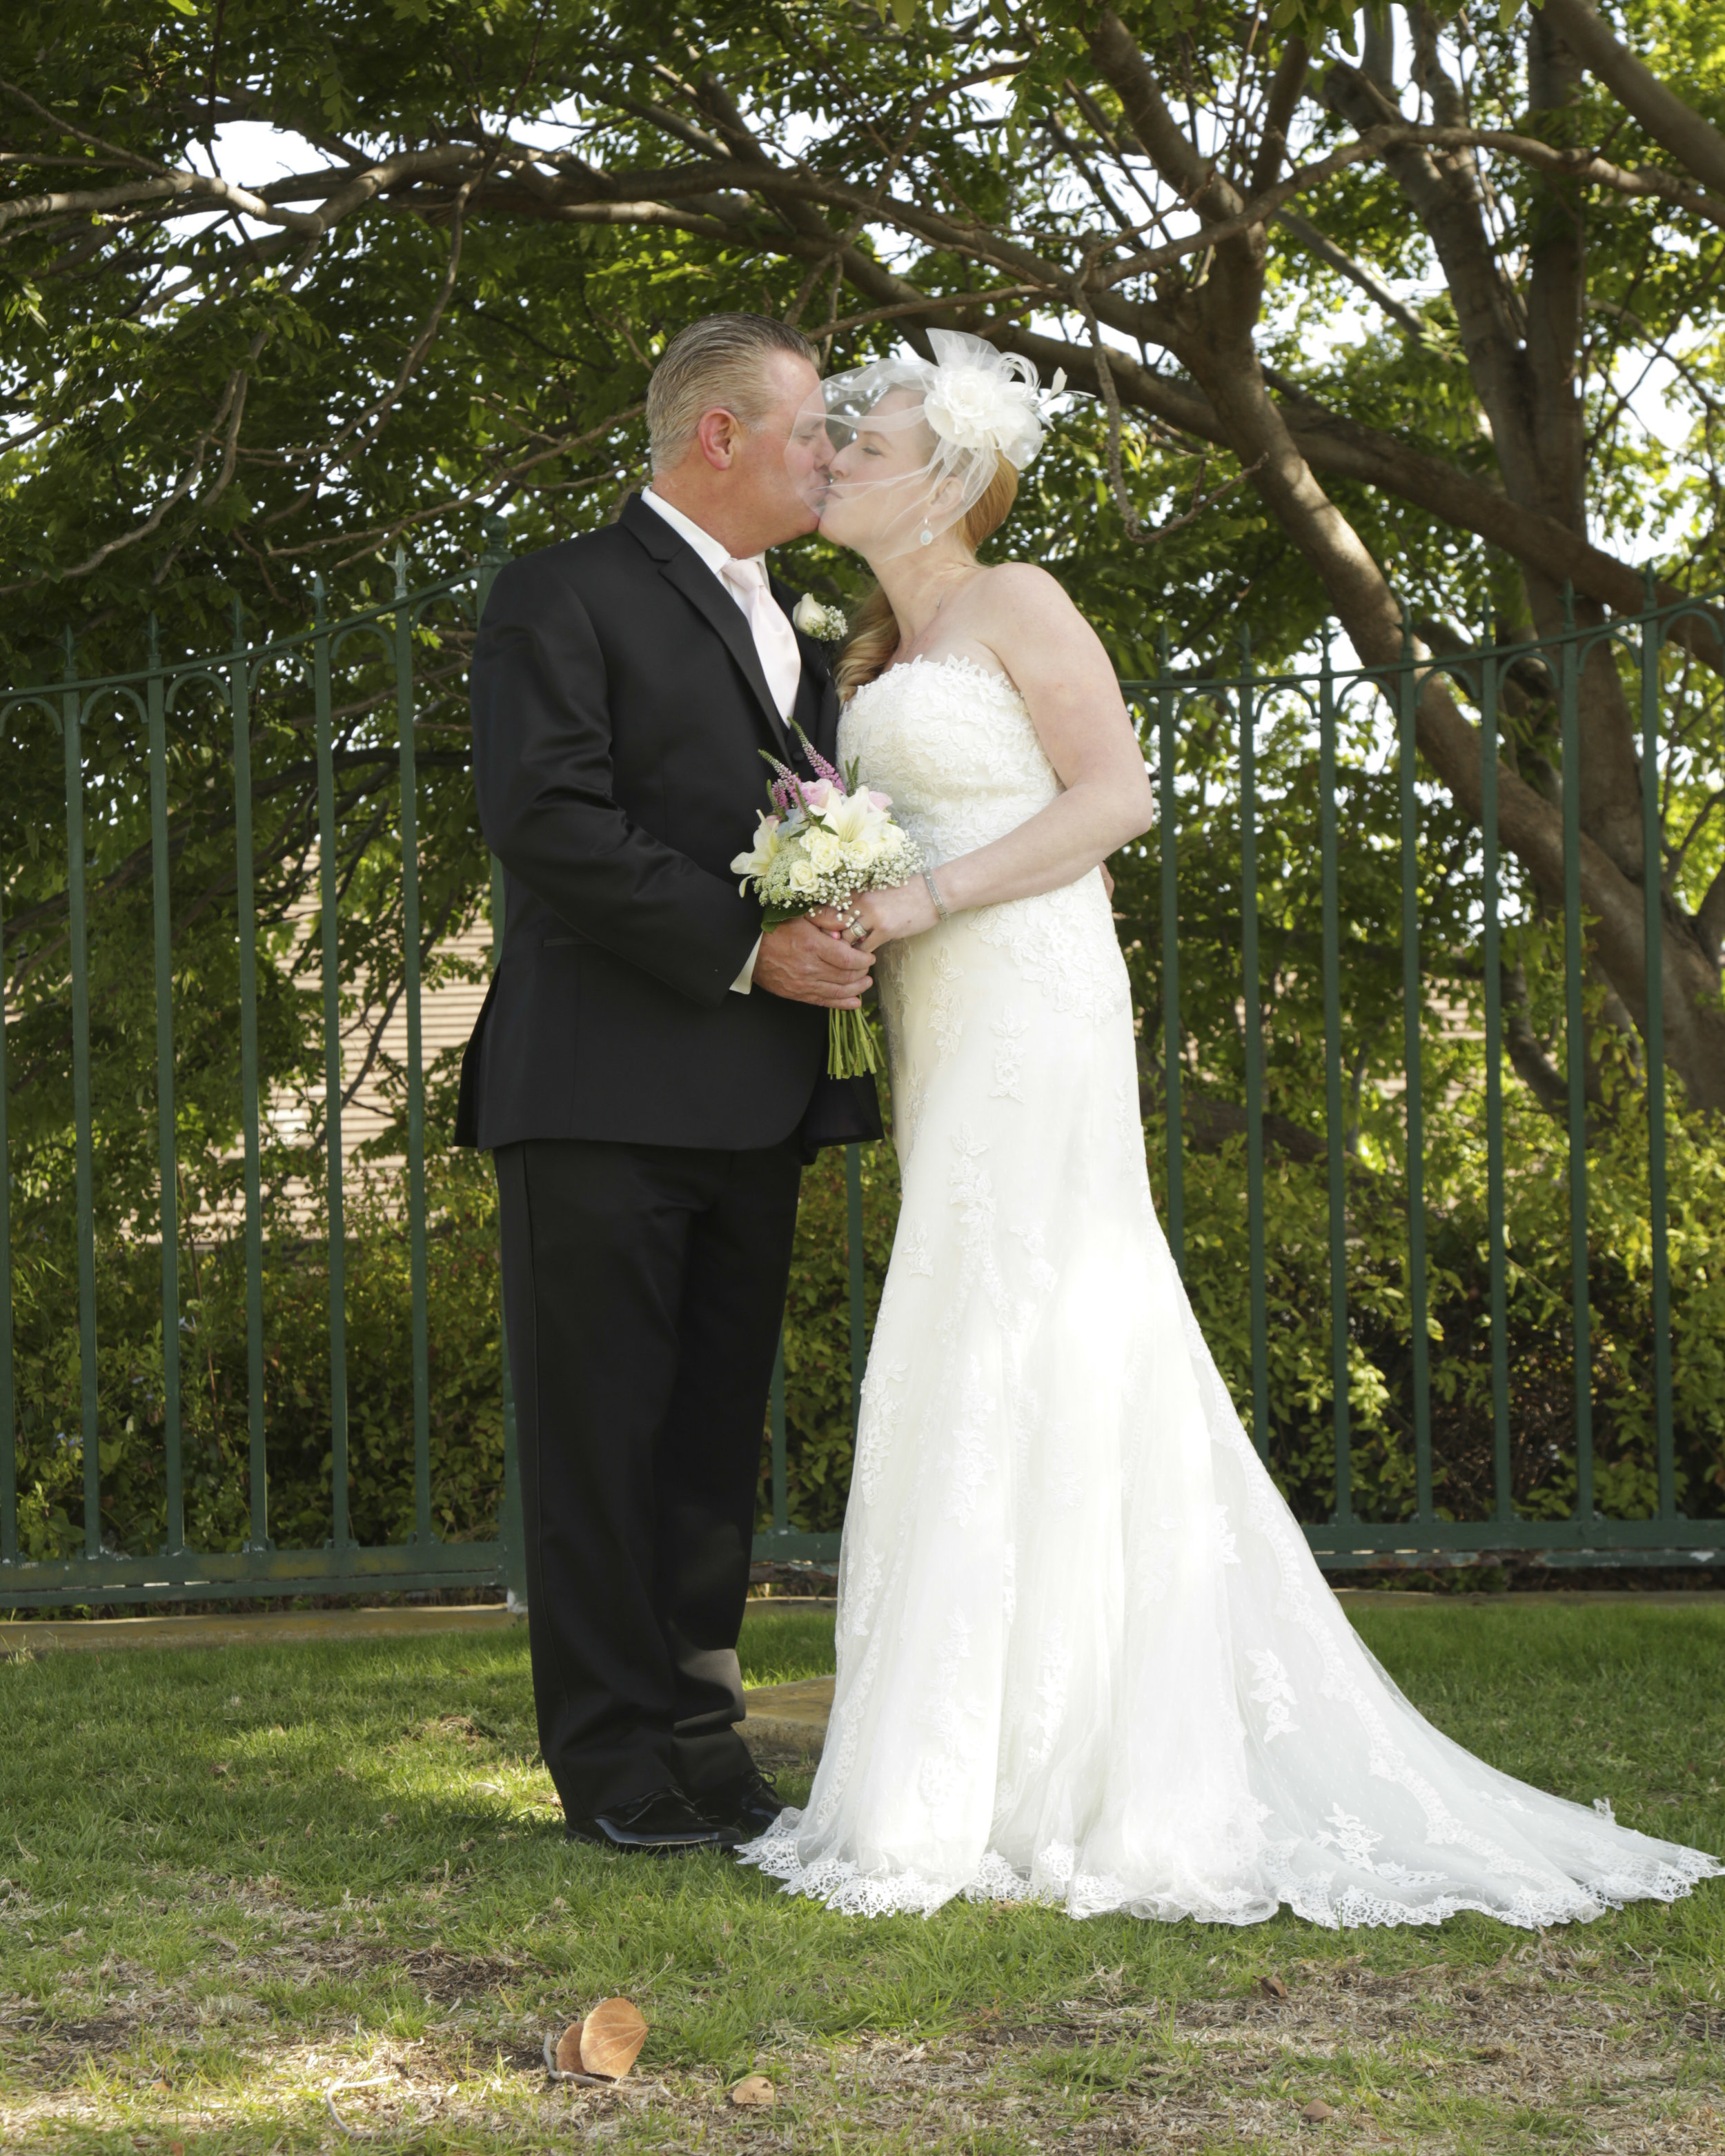 160501_Lambert_Wedding-235.jpg